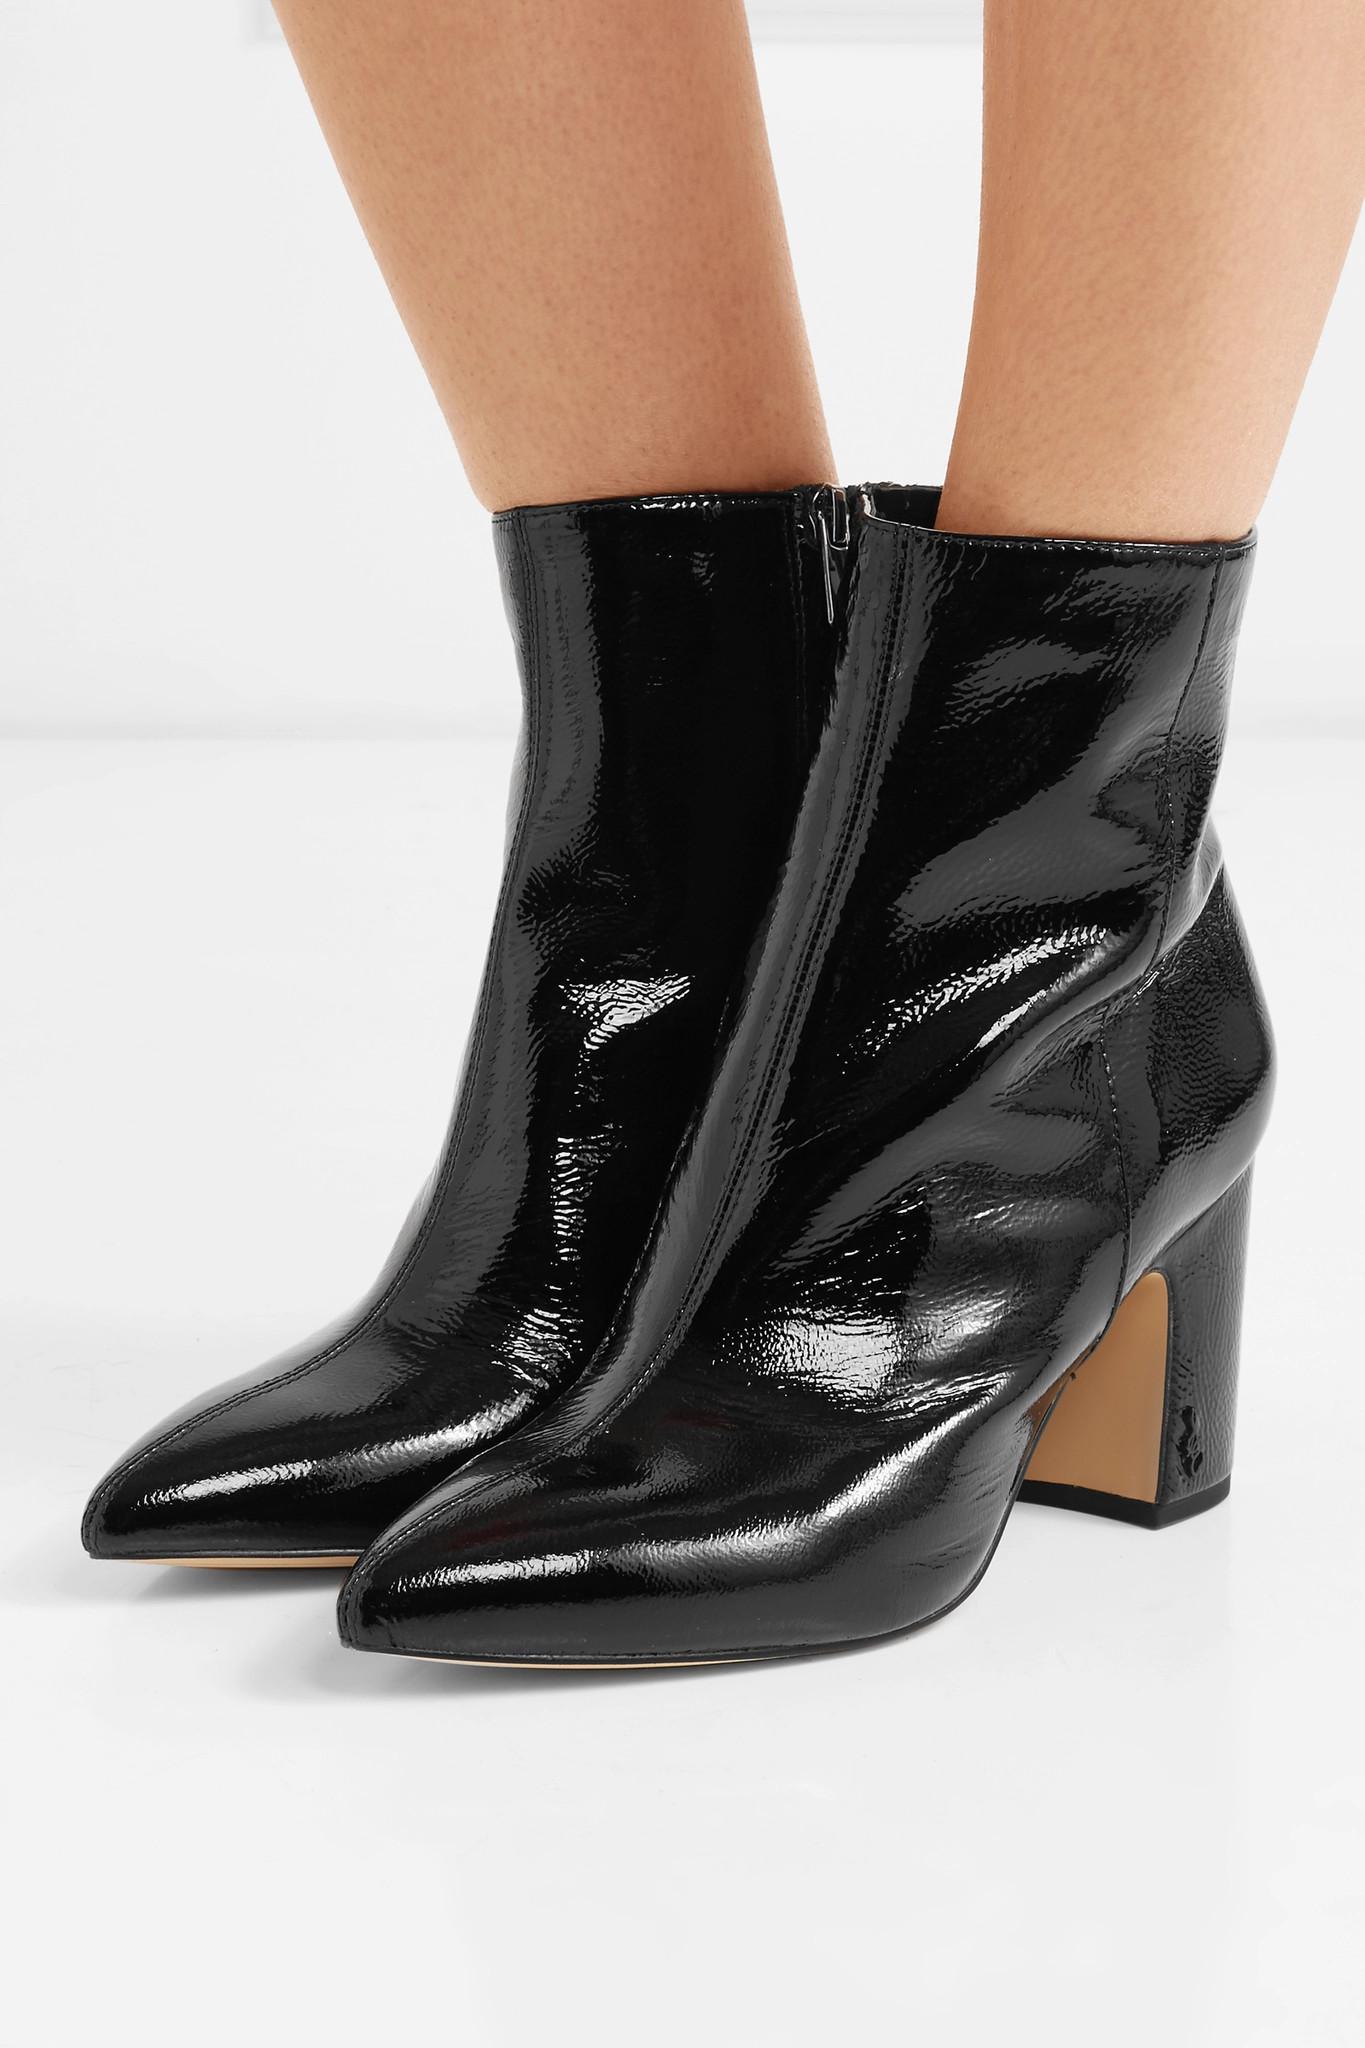 4d1699310c68 Sam Edelman - Black Hilty Patent-leather Ankle Boots - Lyst. View fullscreen